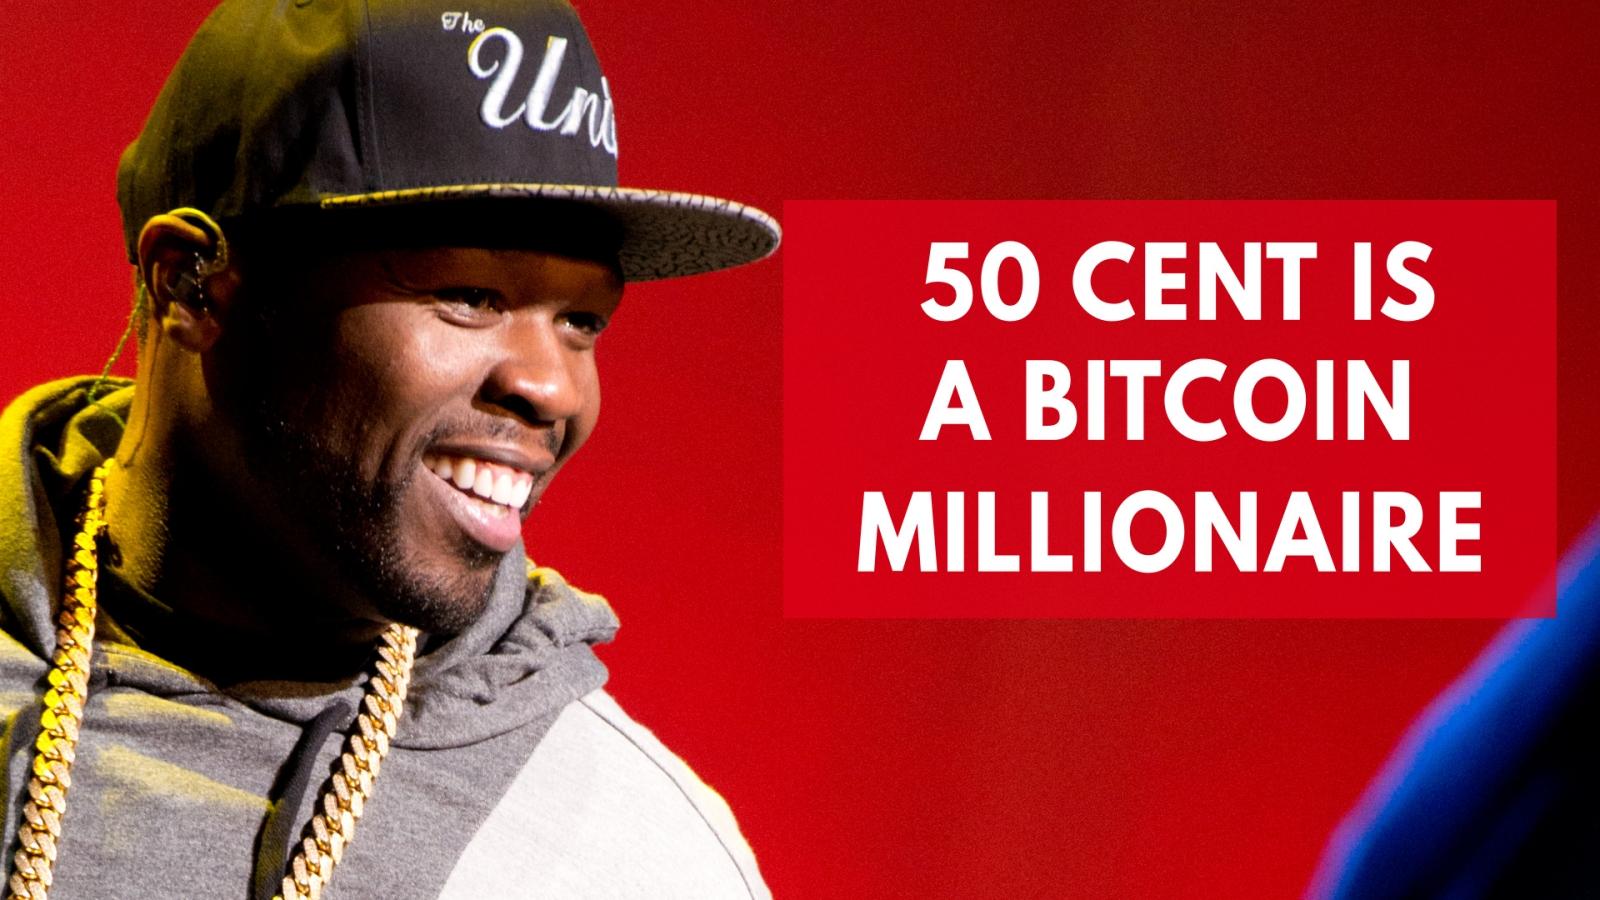 50-cent-is-a-bitcoin-millionaire